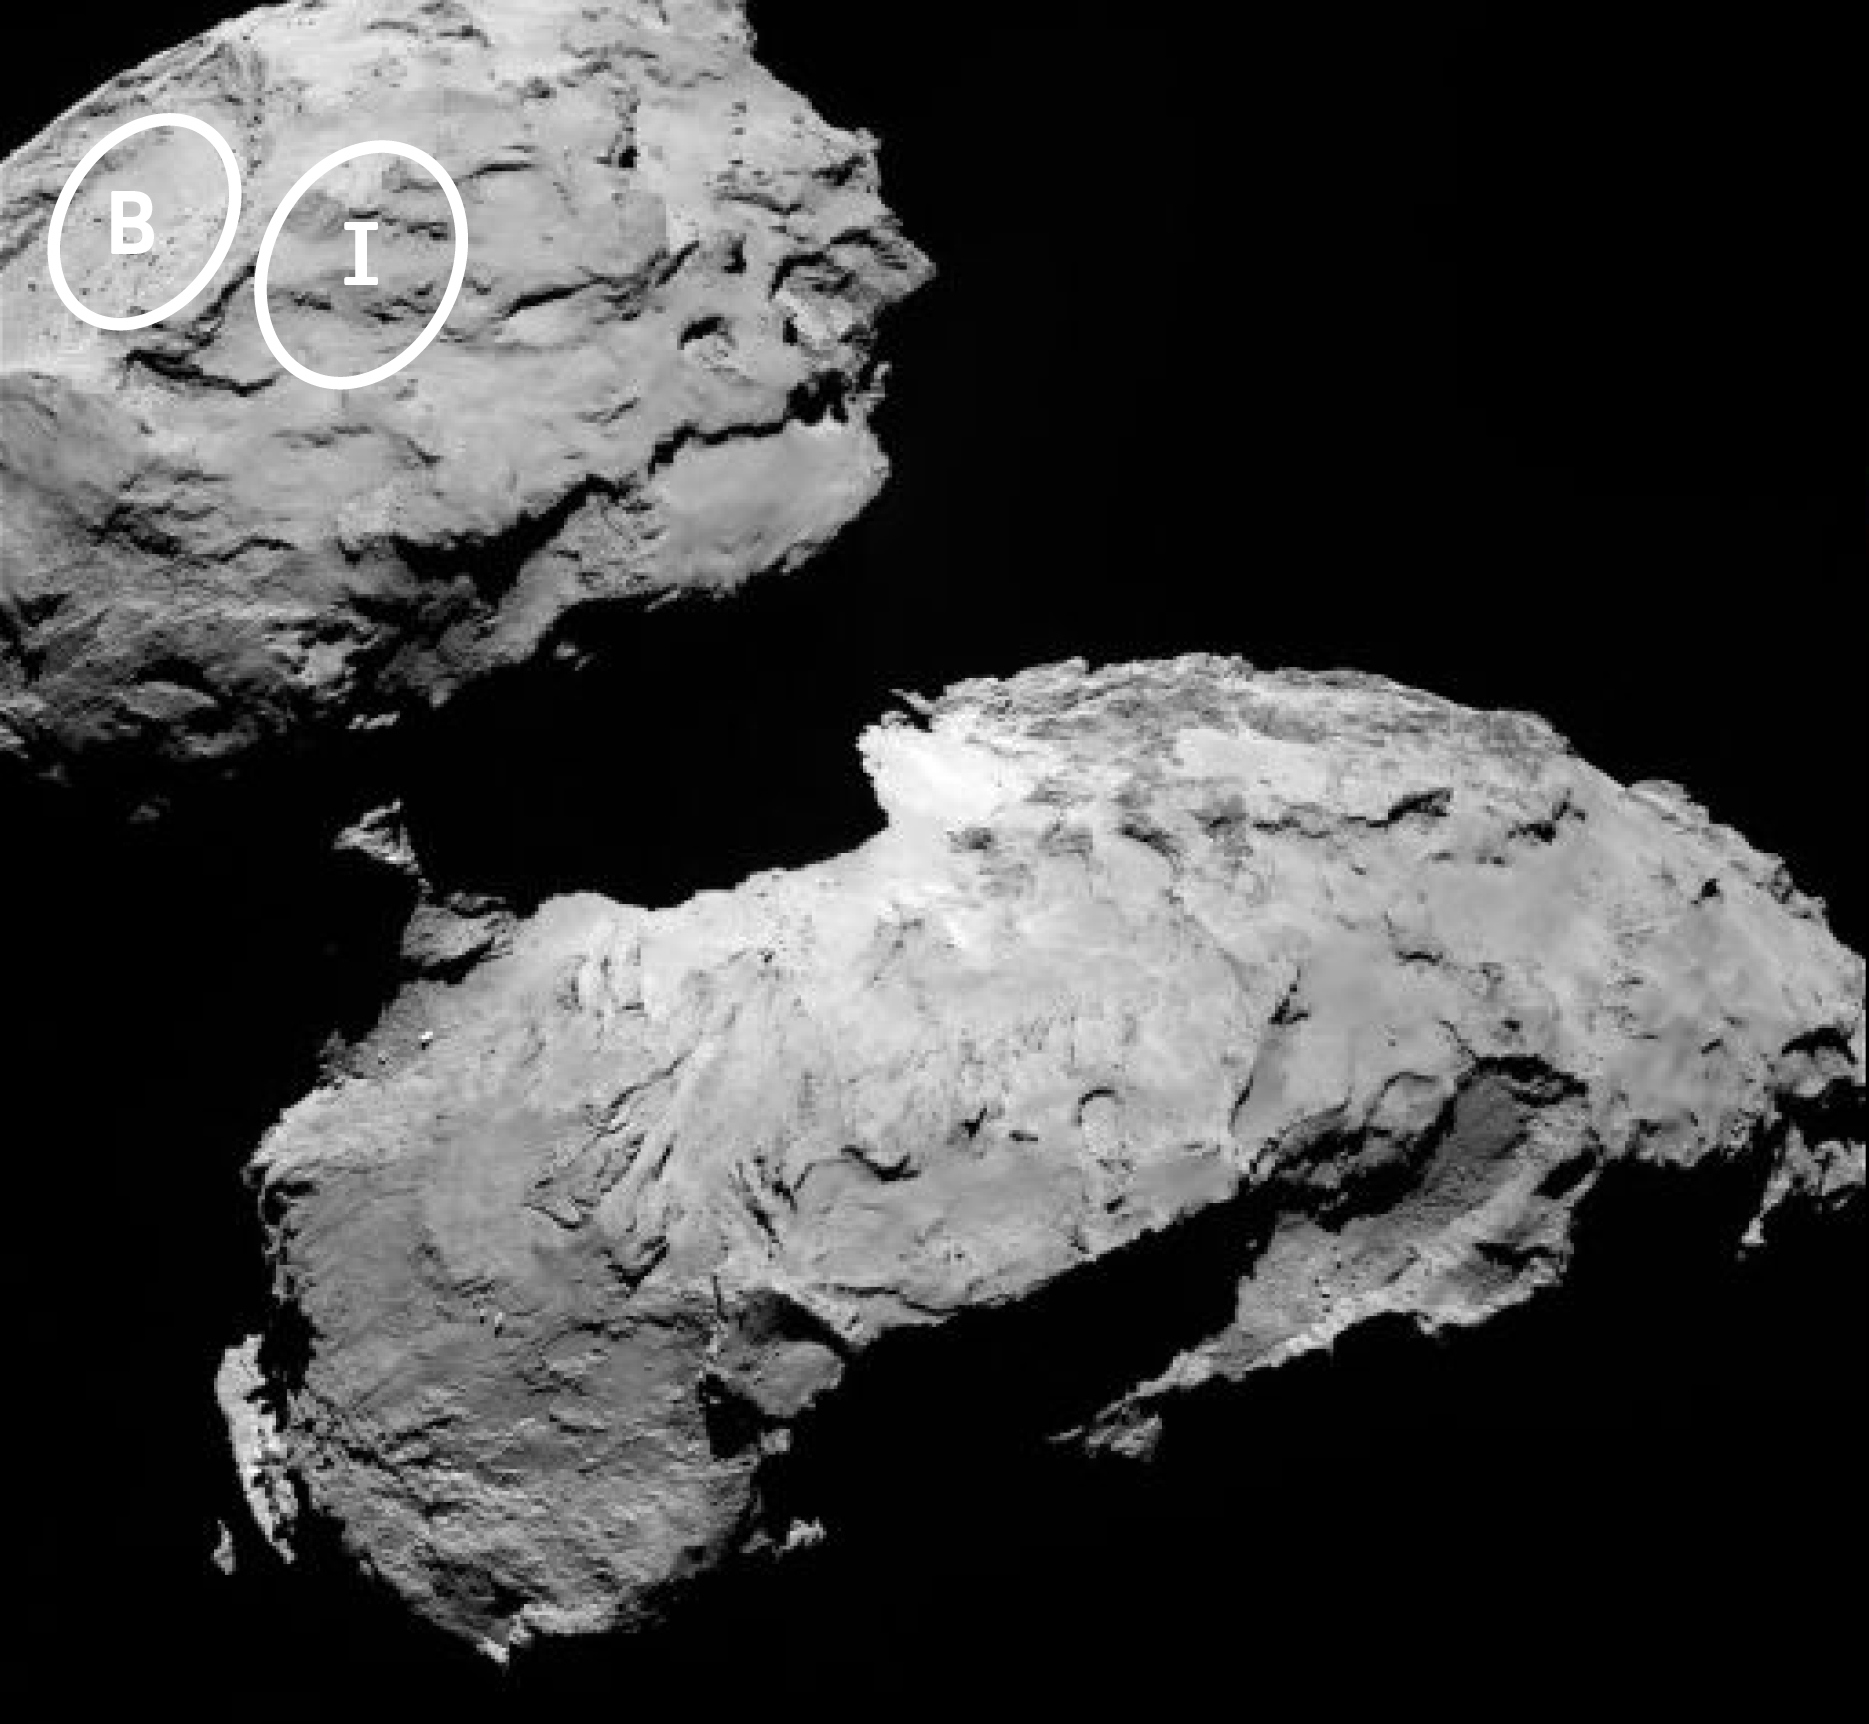 nasa comet lander name - photo #3